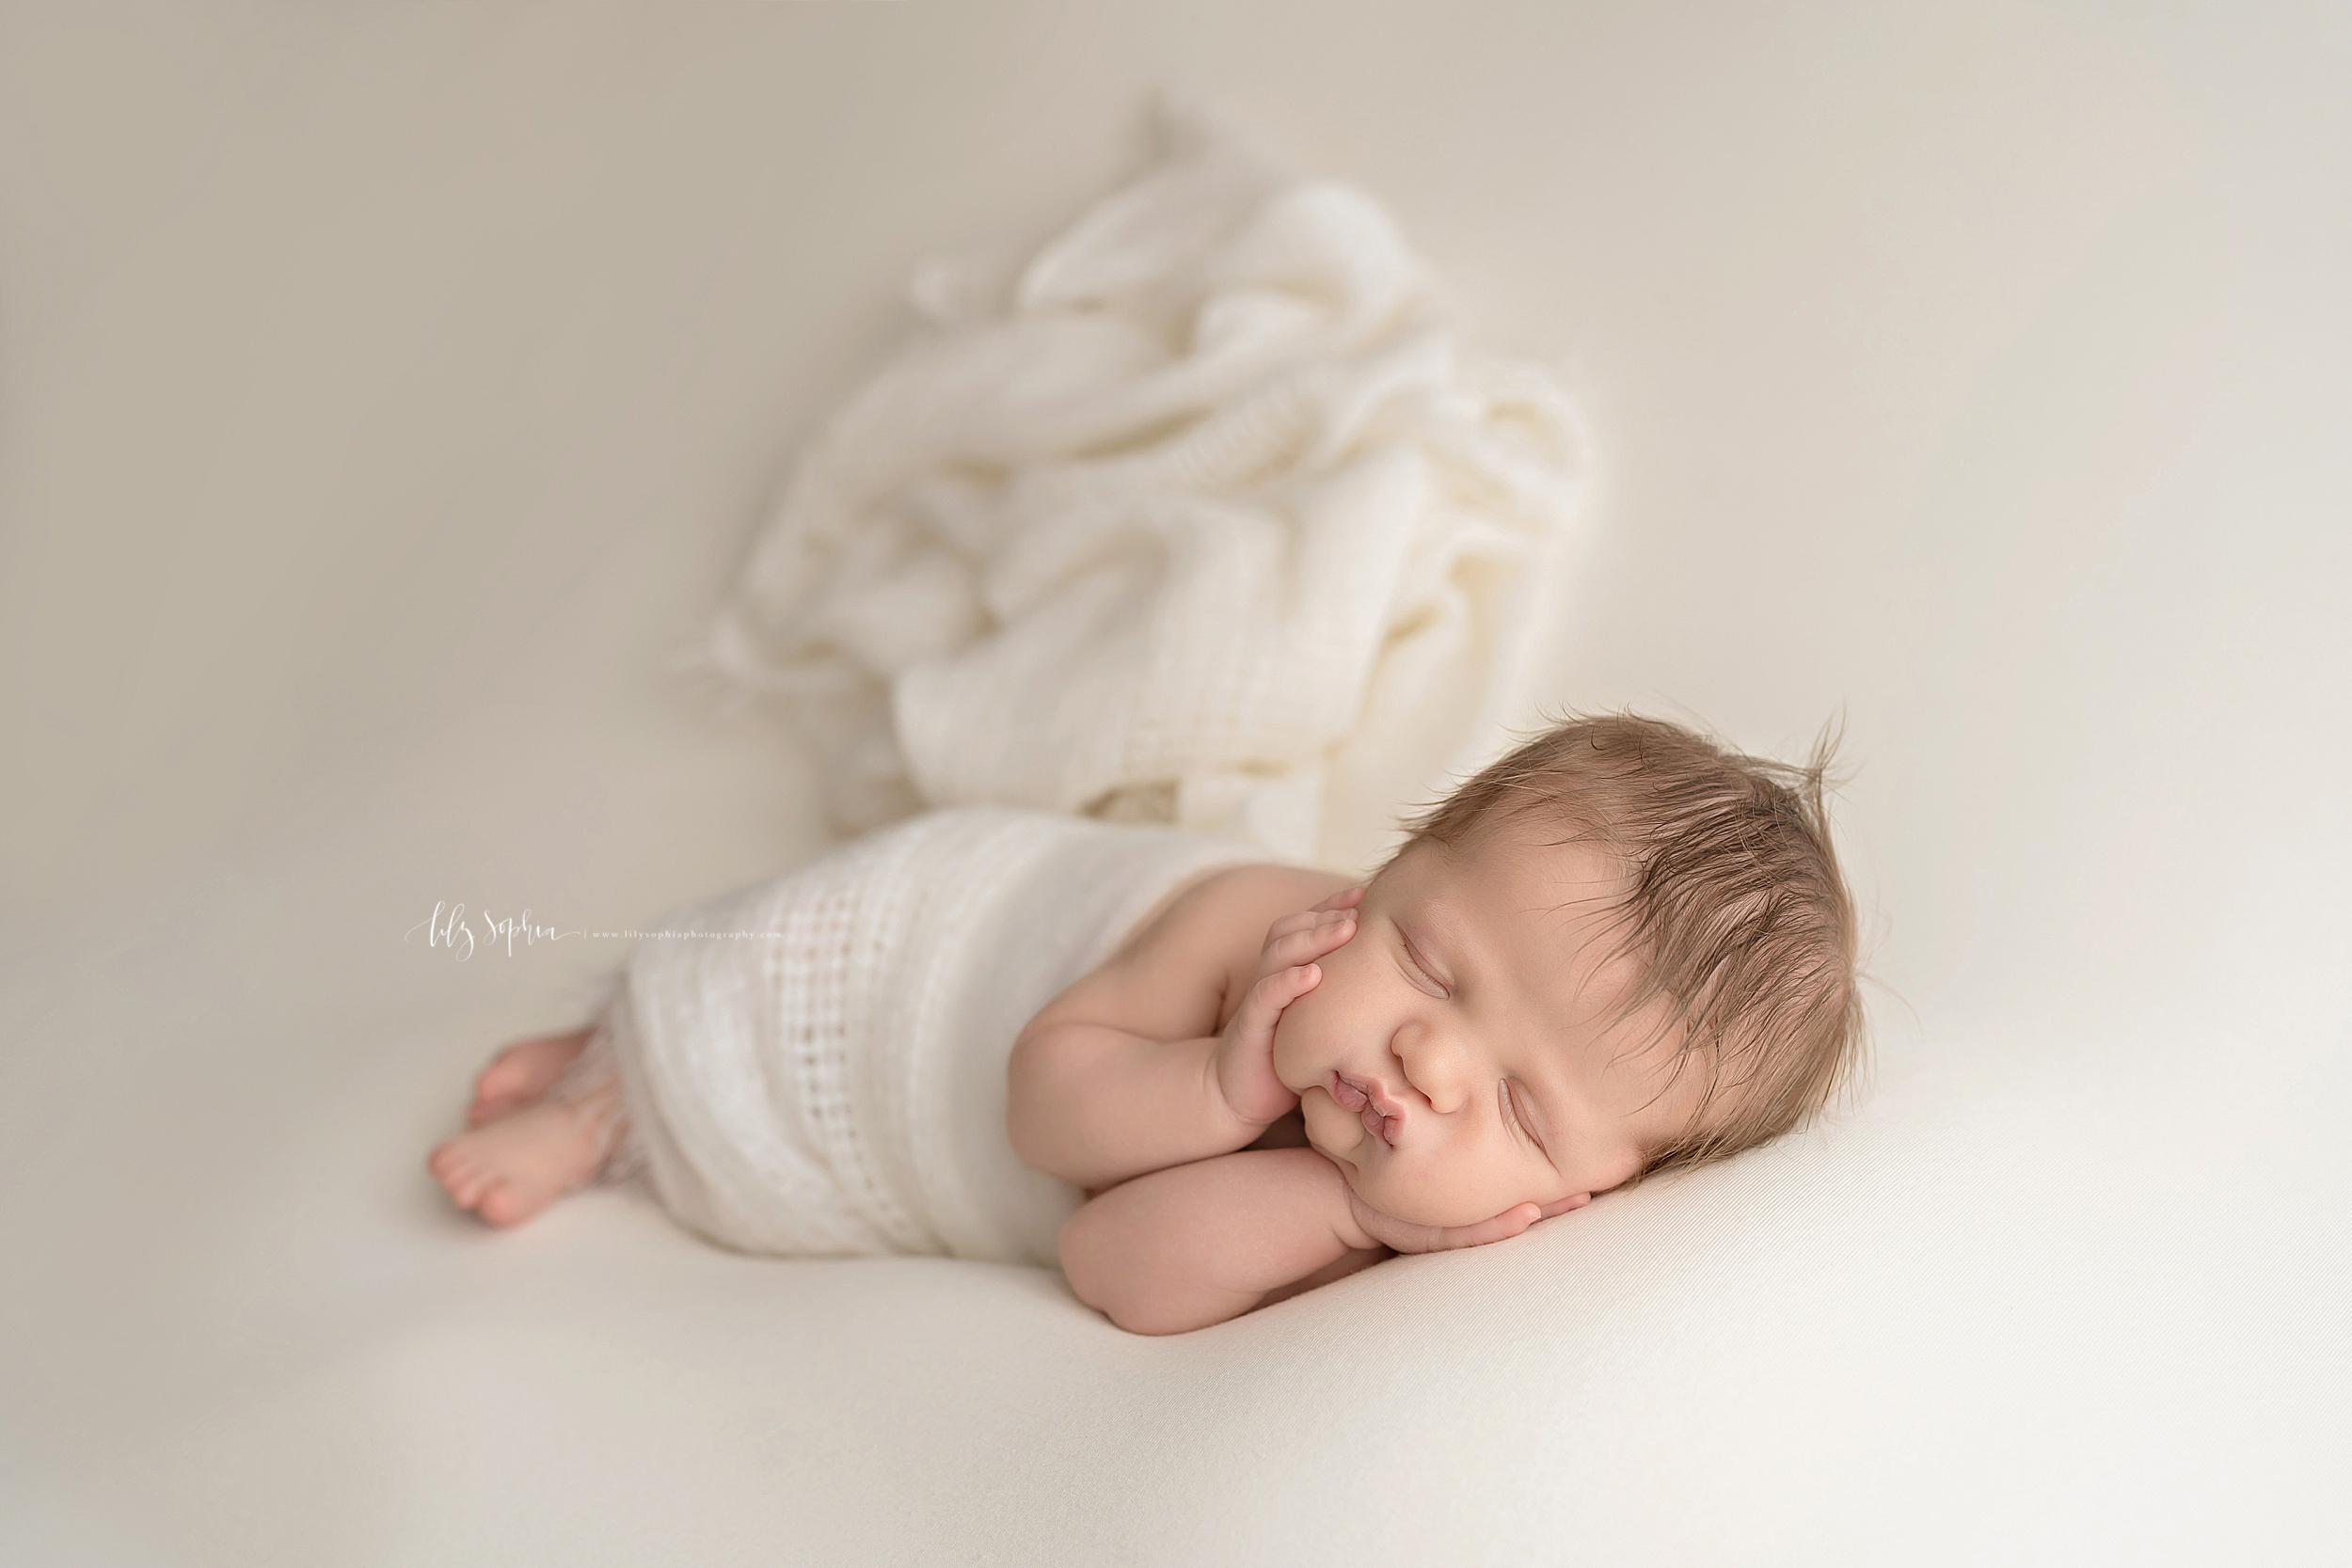 atlanta-midtown-brookhaven-ashford-dunwoody-virginia-highlands-roswell-decatur-lily-sophia-photography-newborn-baby-boy-big-brother-family-studio-session_0595.jpg